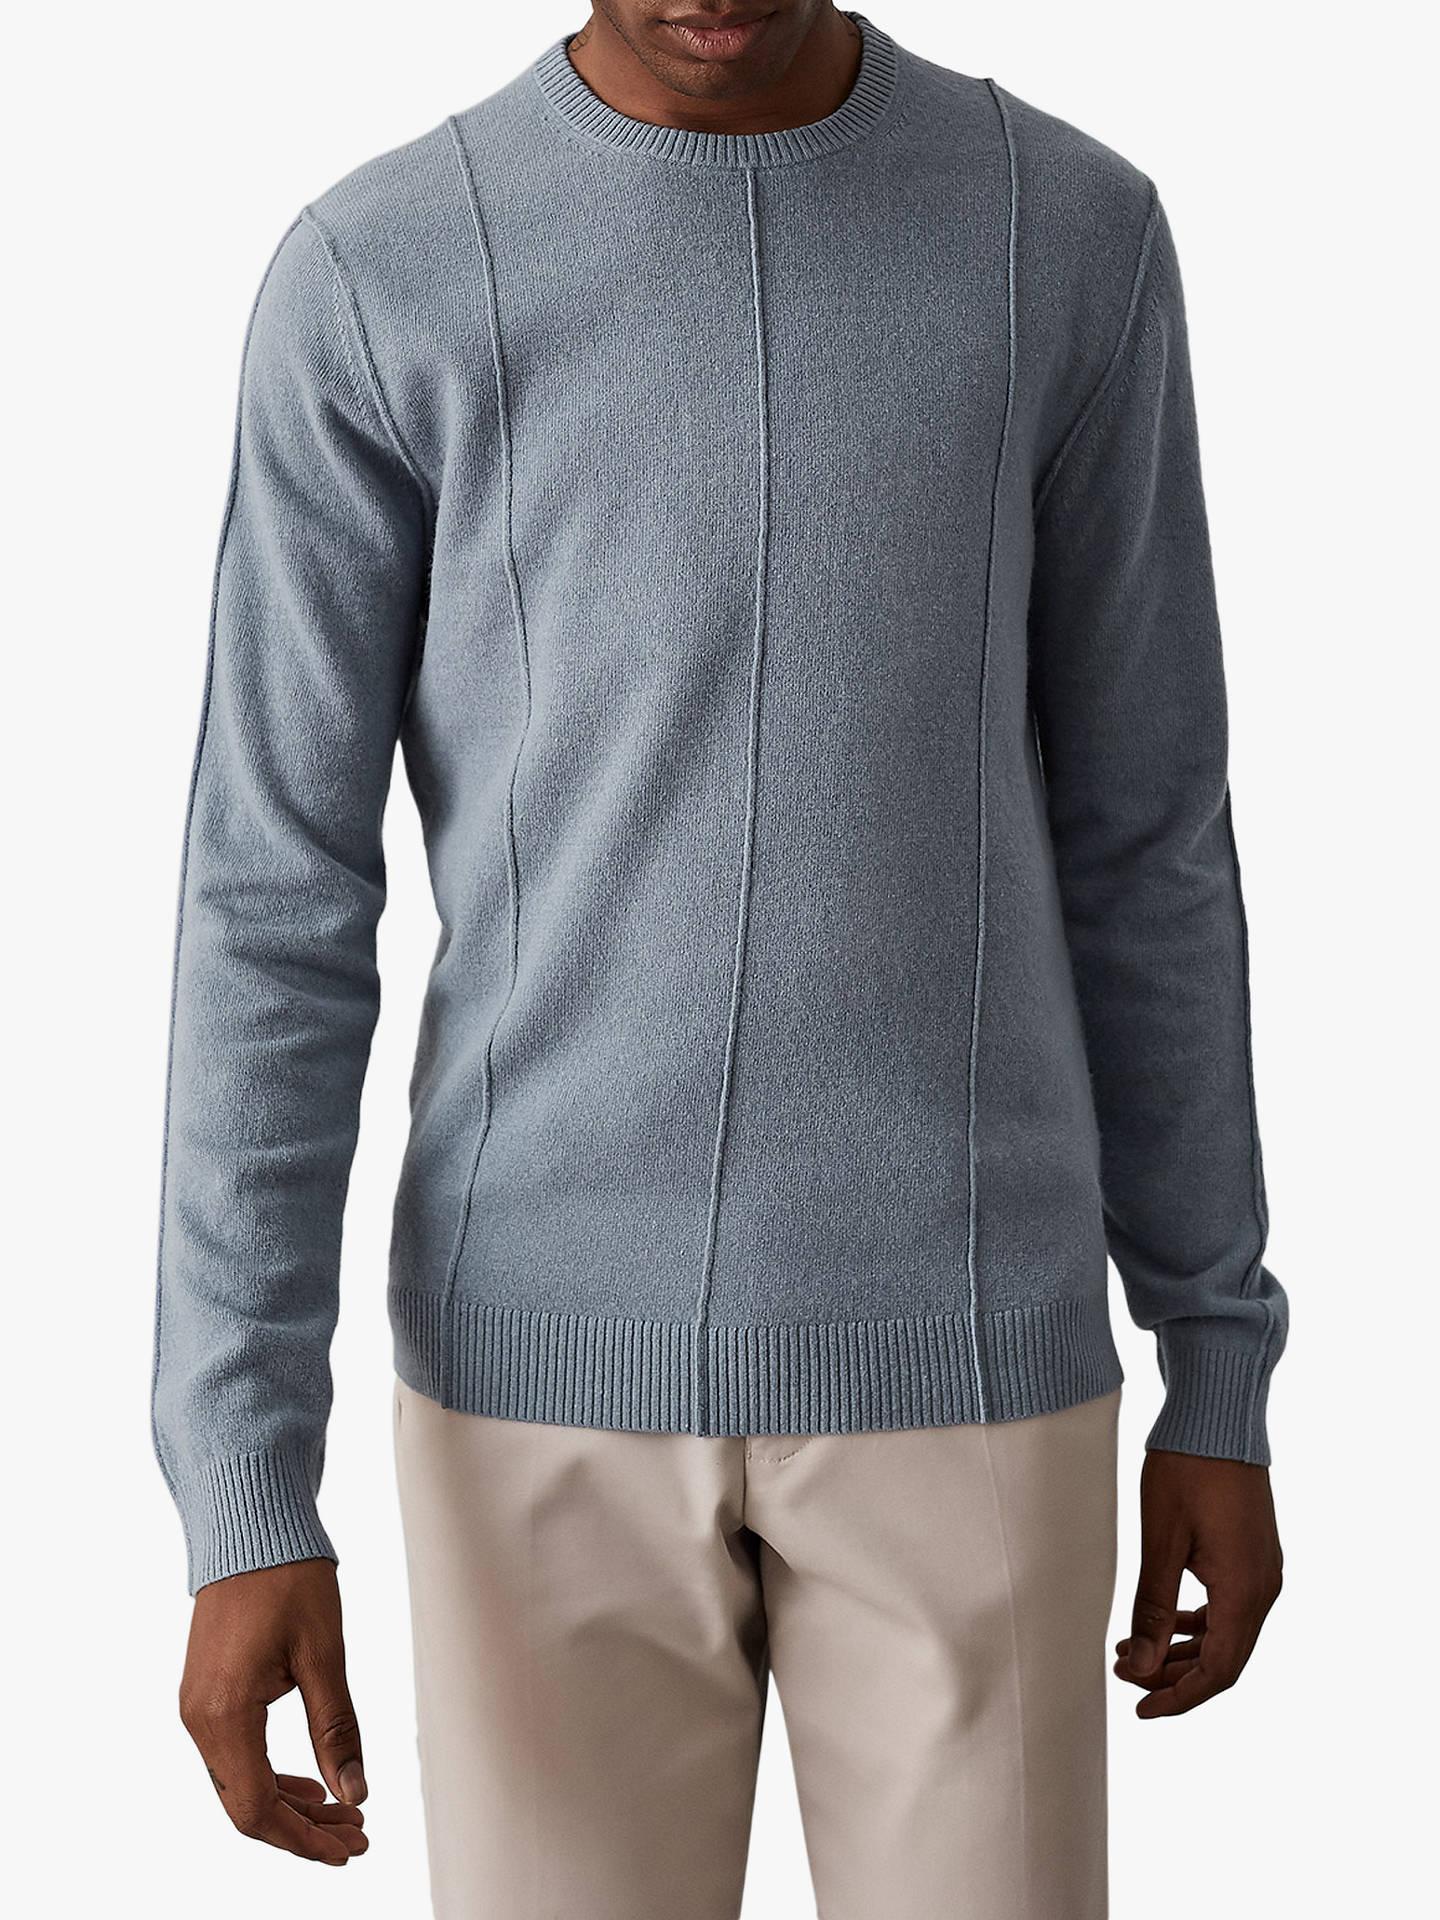 9e117180e22 Buy Reiss Champion Wool Cashmere Jumper, Airforce Blue, XL Online at  johnlewis.com ...